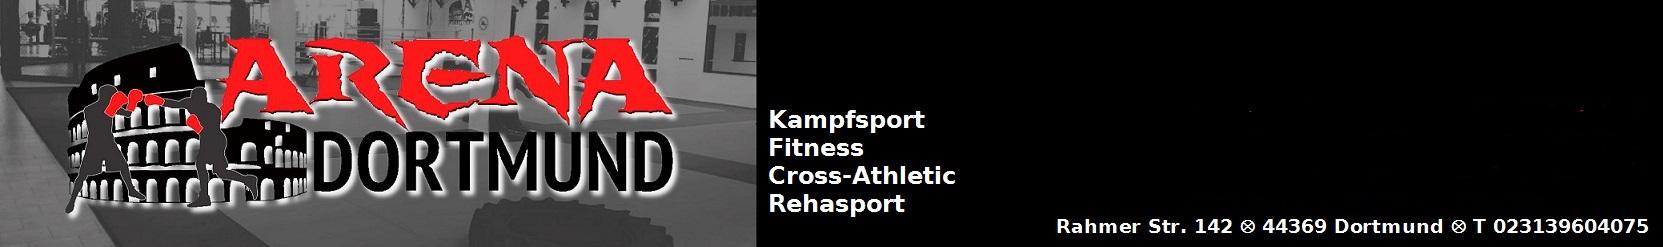 Arena Dortmund - Kampfsport - Fitness - Bodybuilding - Reha - Physio